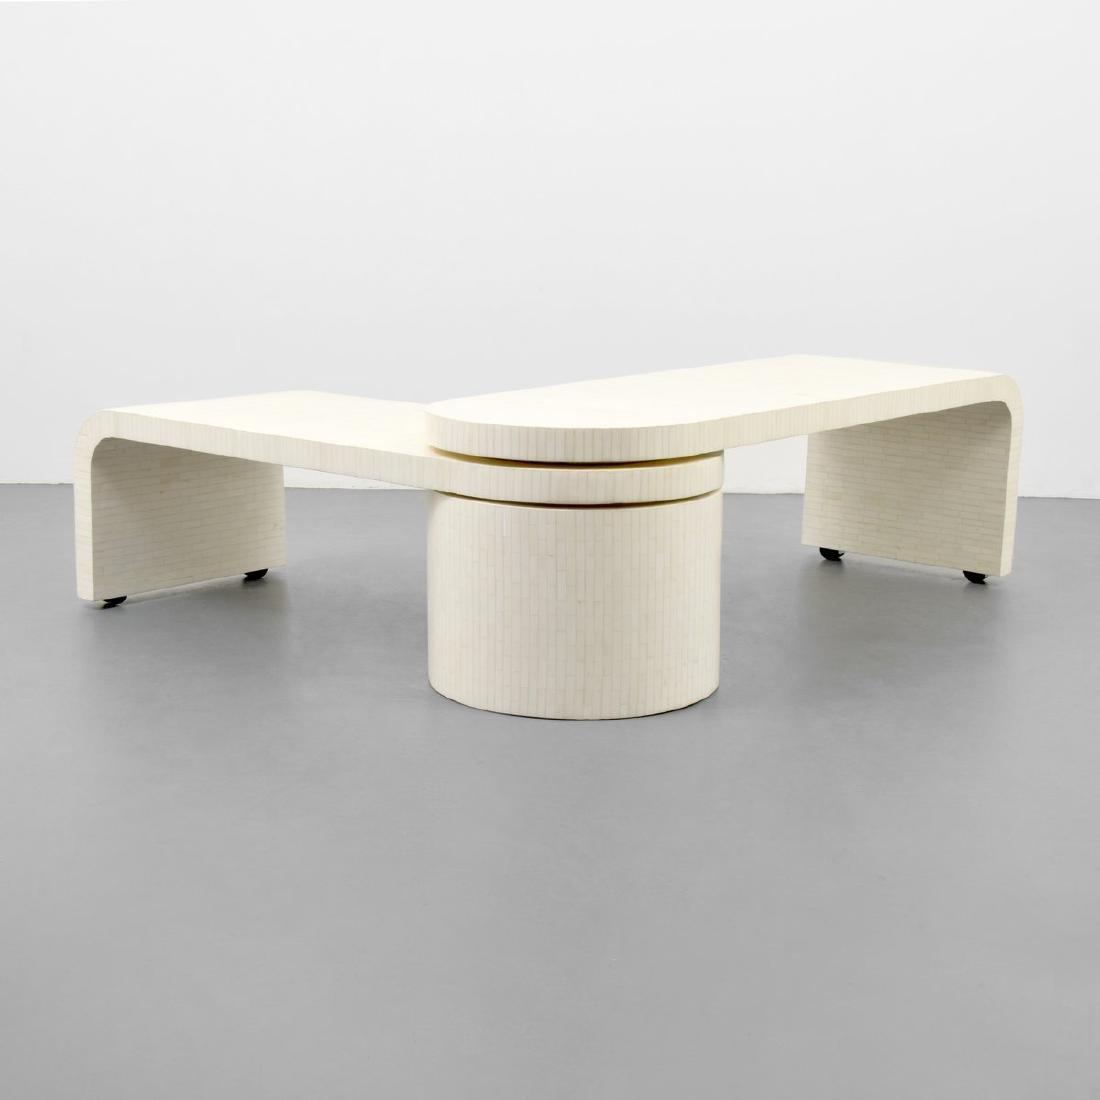 Tessellated Bone Coffee Table, Manner of Karl Springer